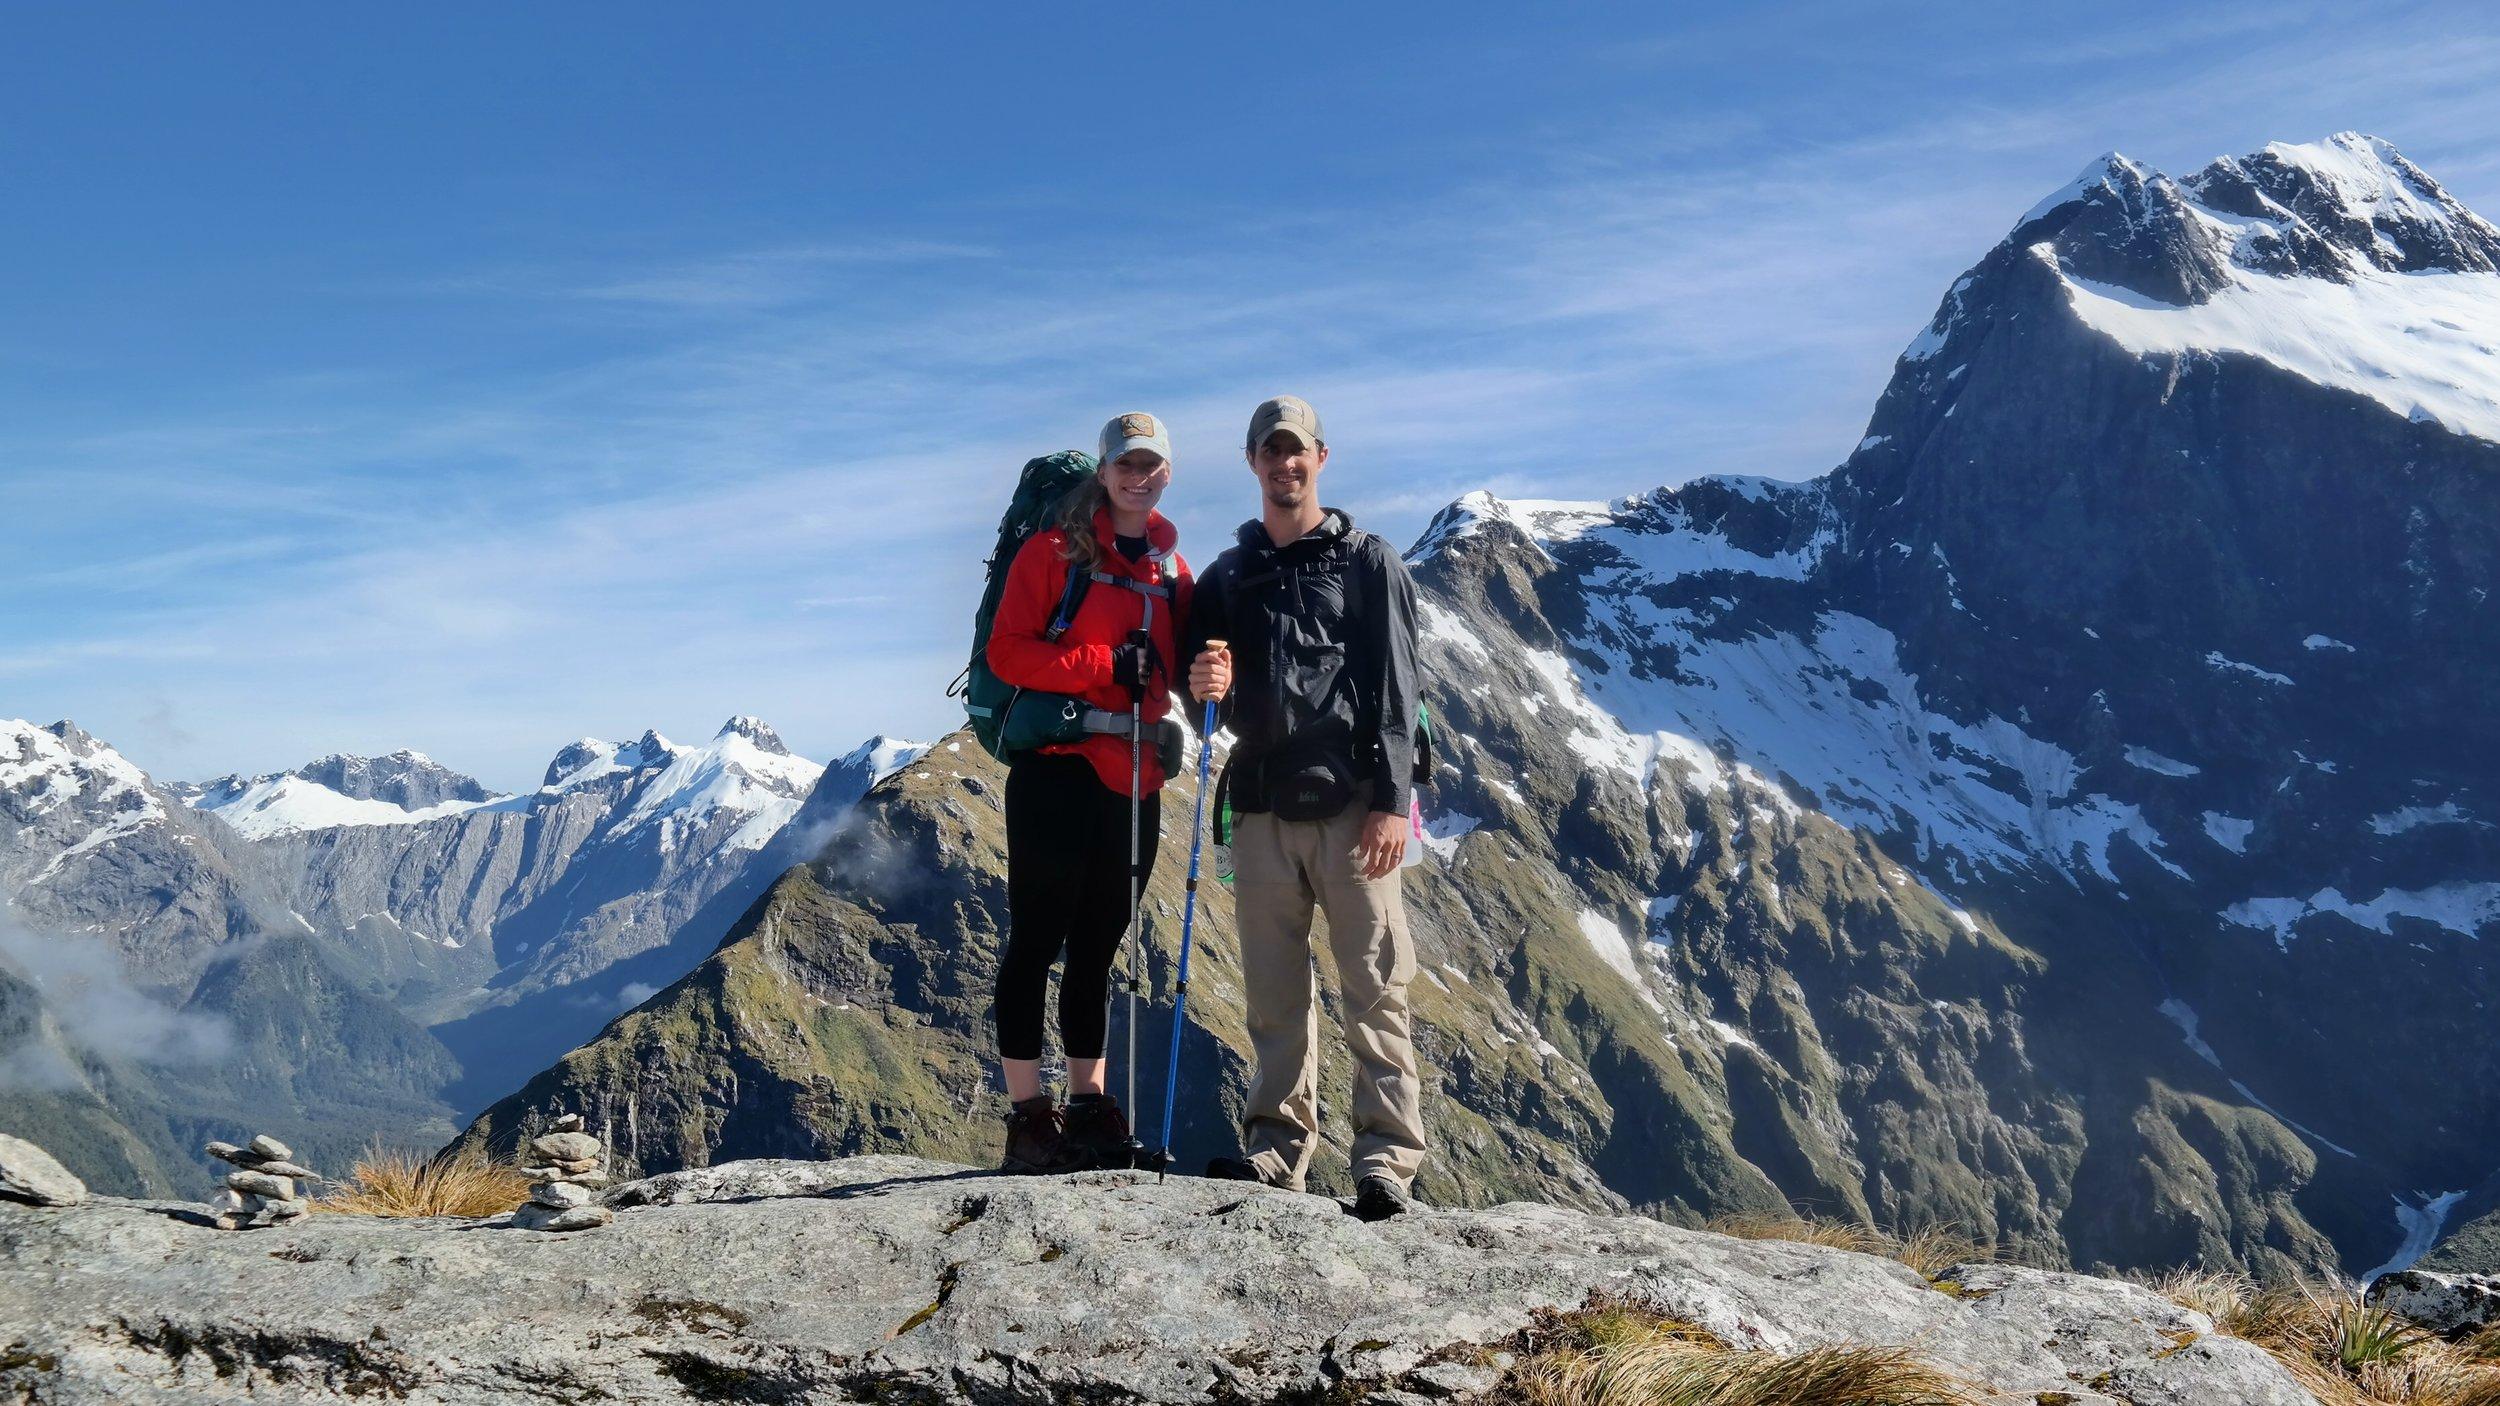 On Mackinnon Pass, elevation 1,154 meters